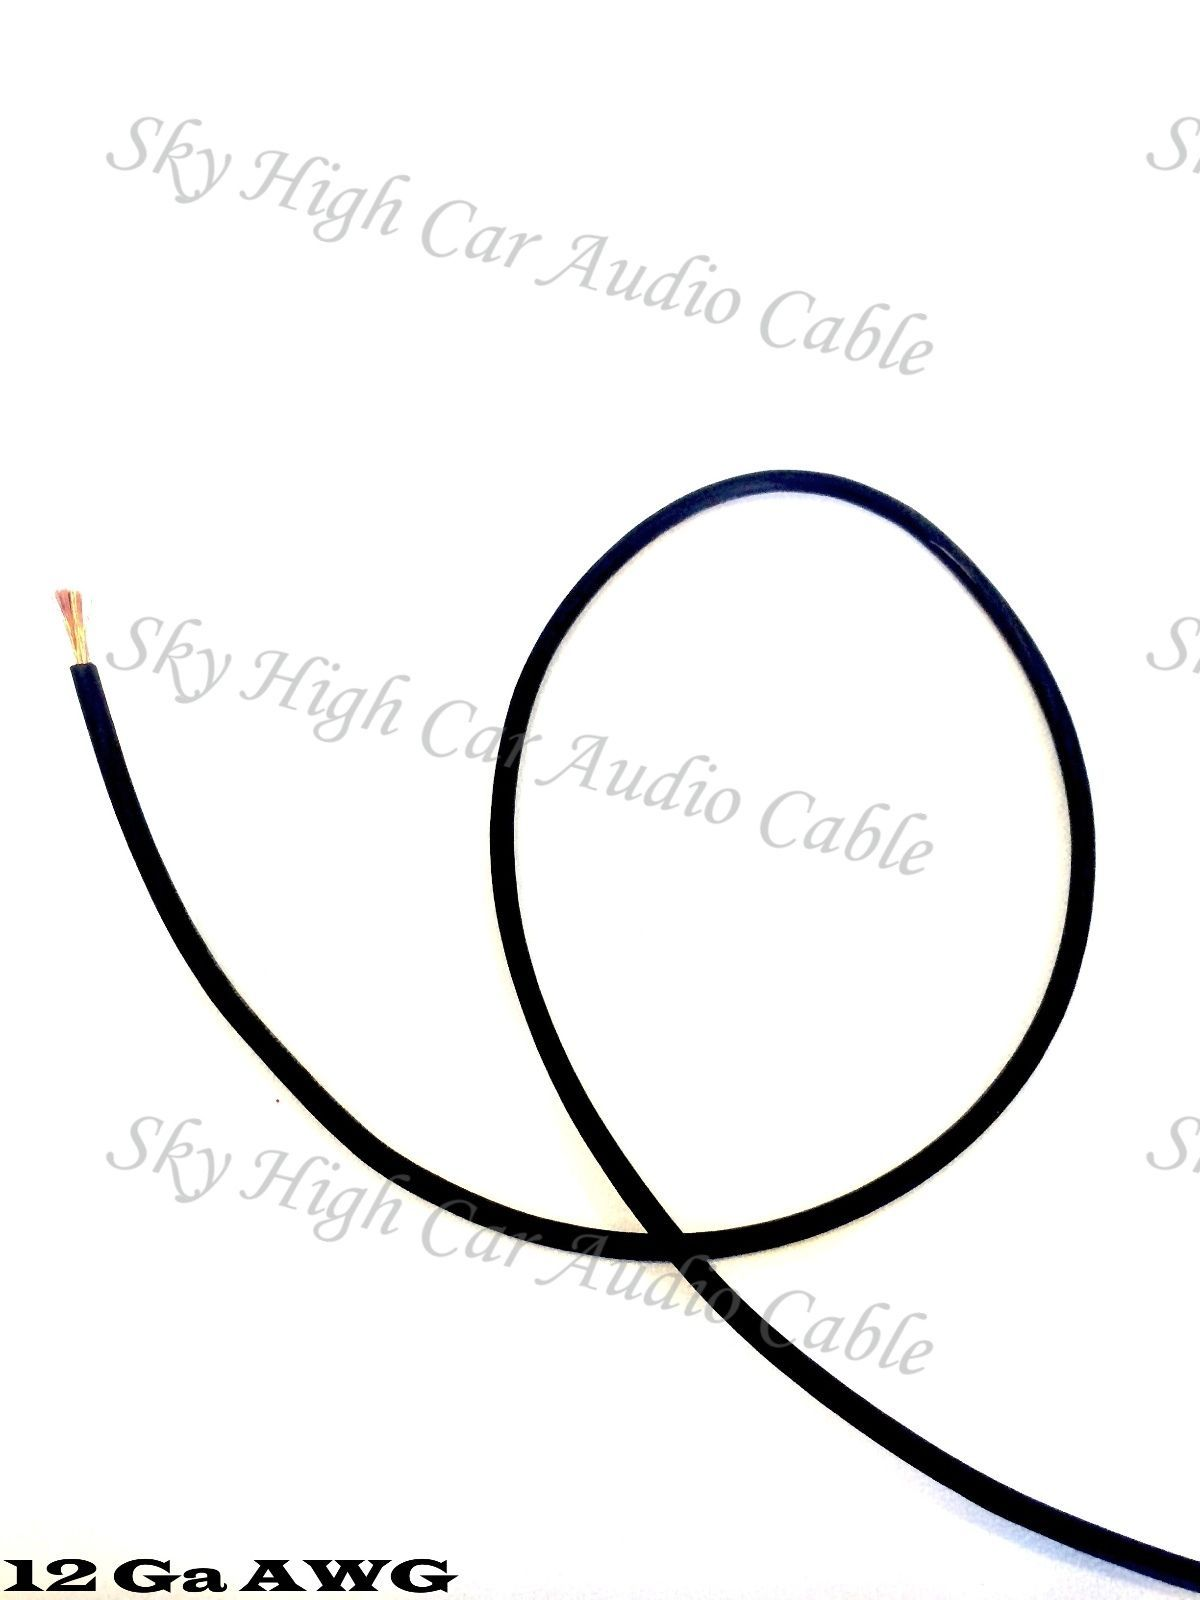 50 Ft 12 Gauge Awg Primary Remote Wire Black Sky High Car Audio Lead Ga Feet